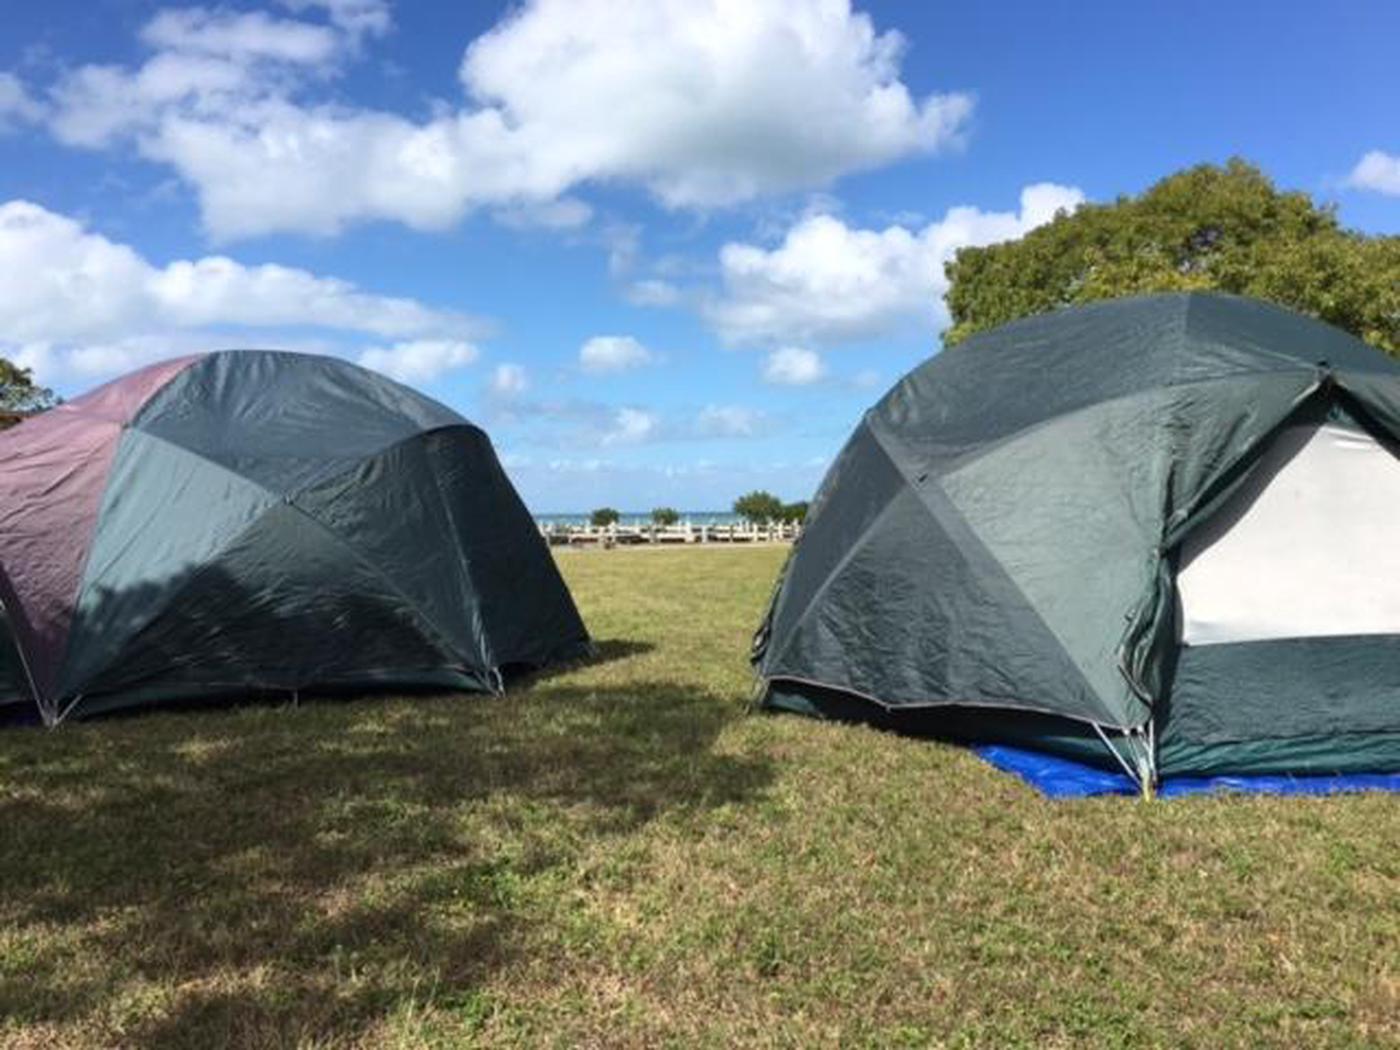 Camping on Elliott Key